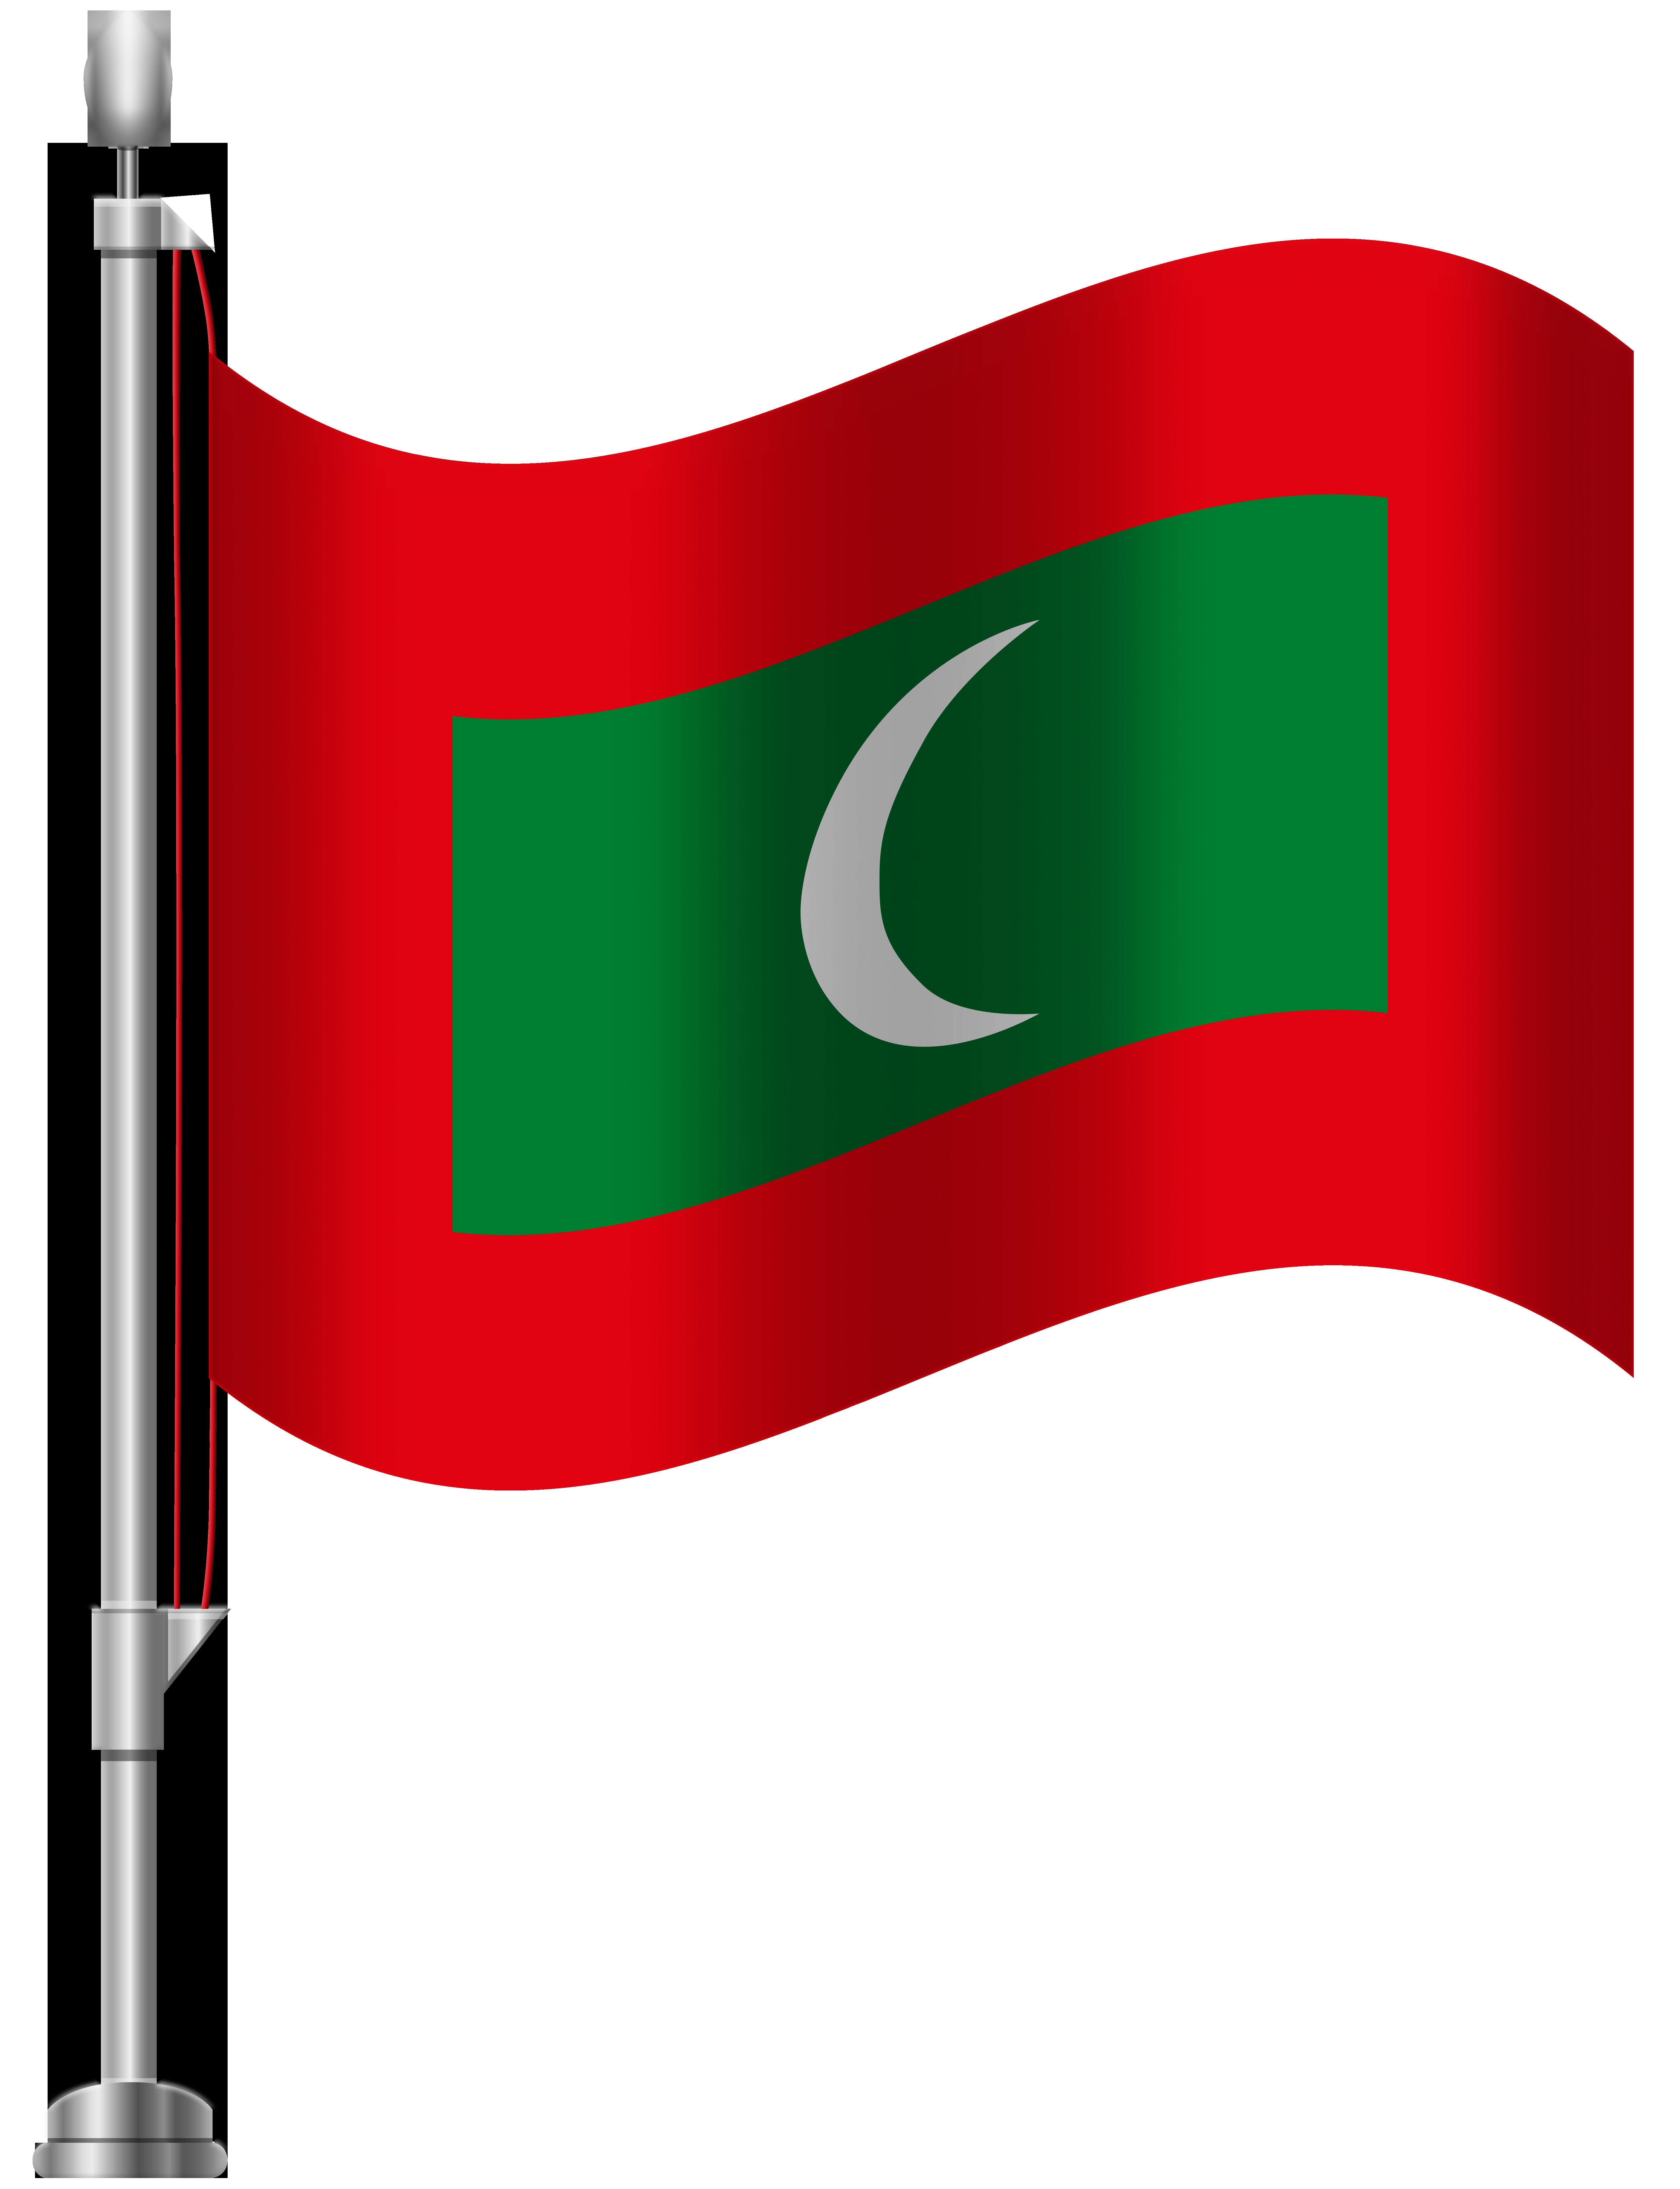 Maldivian clipart #1, Download drawings